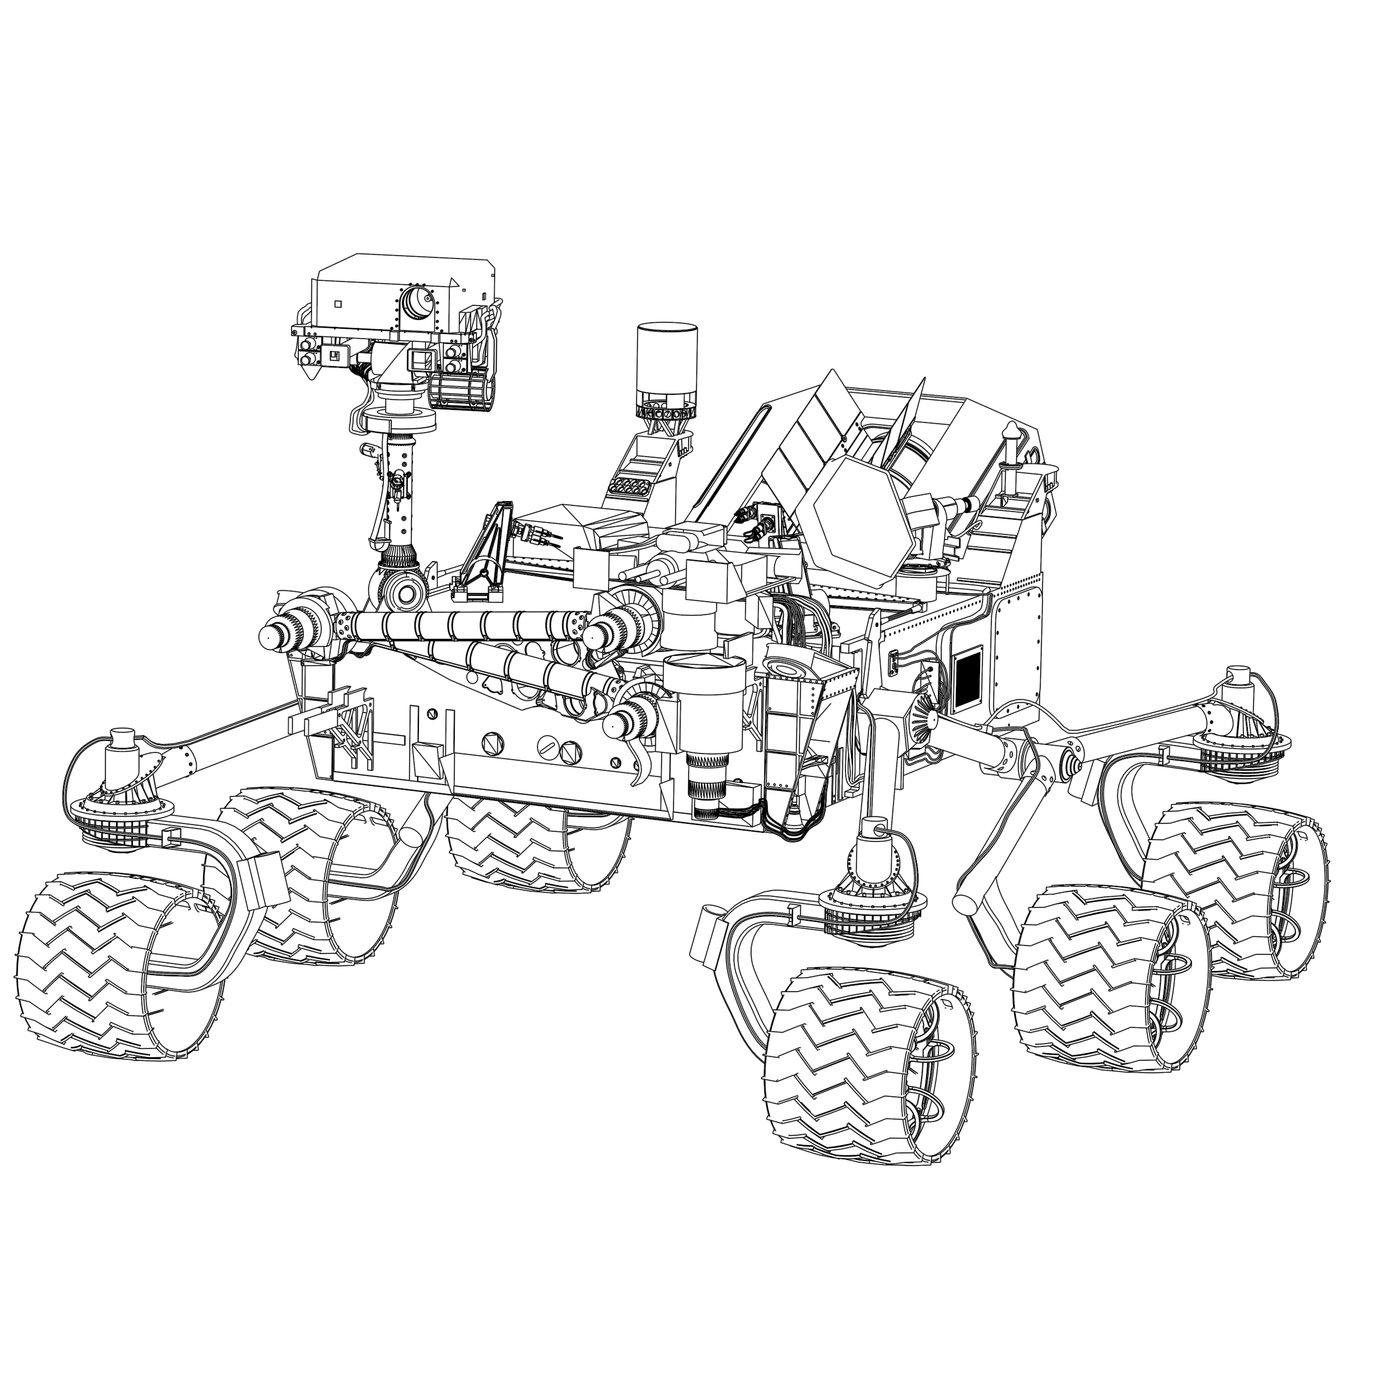 Mars Curiosity Rover By Brian Haeger At Coroflot